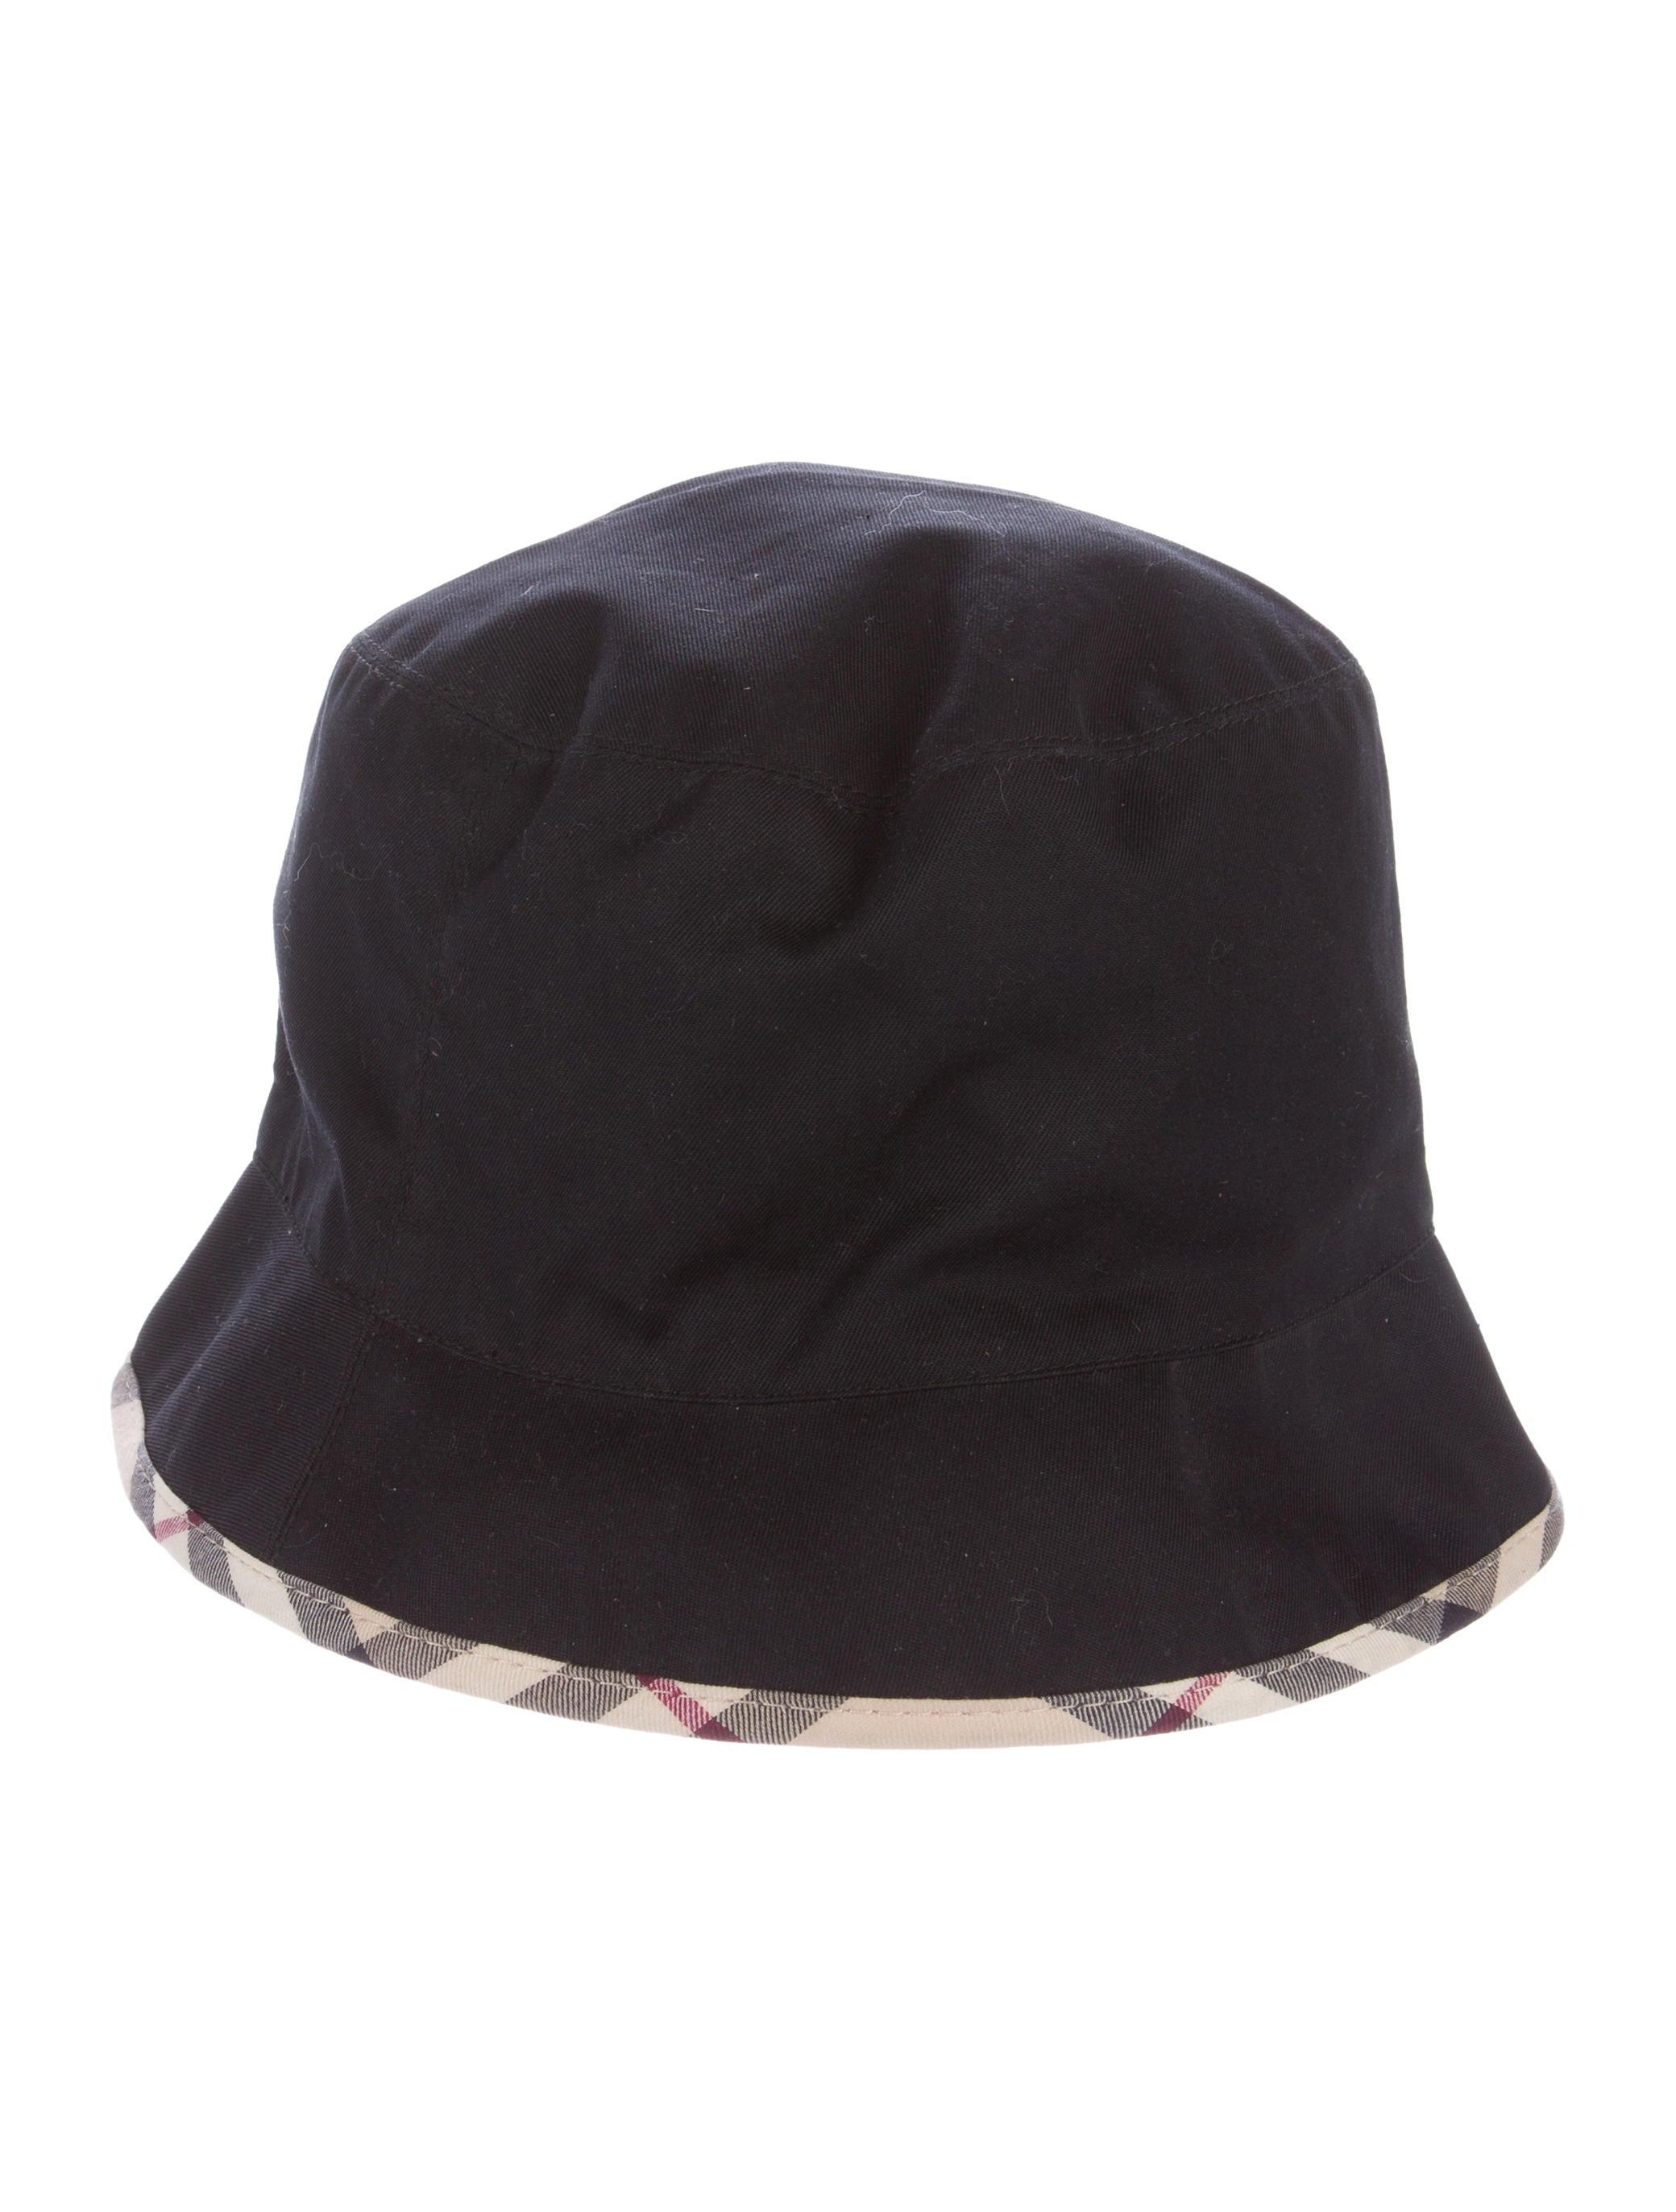 Burberry London Nova Check Bucket Hat - Accessories - WBURL24734 ... fce6d178c34